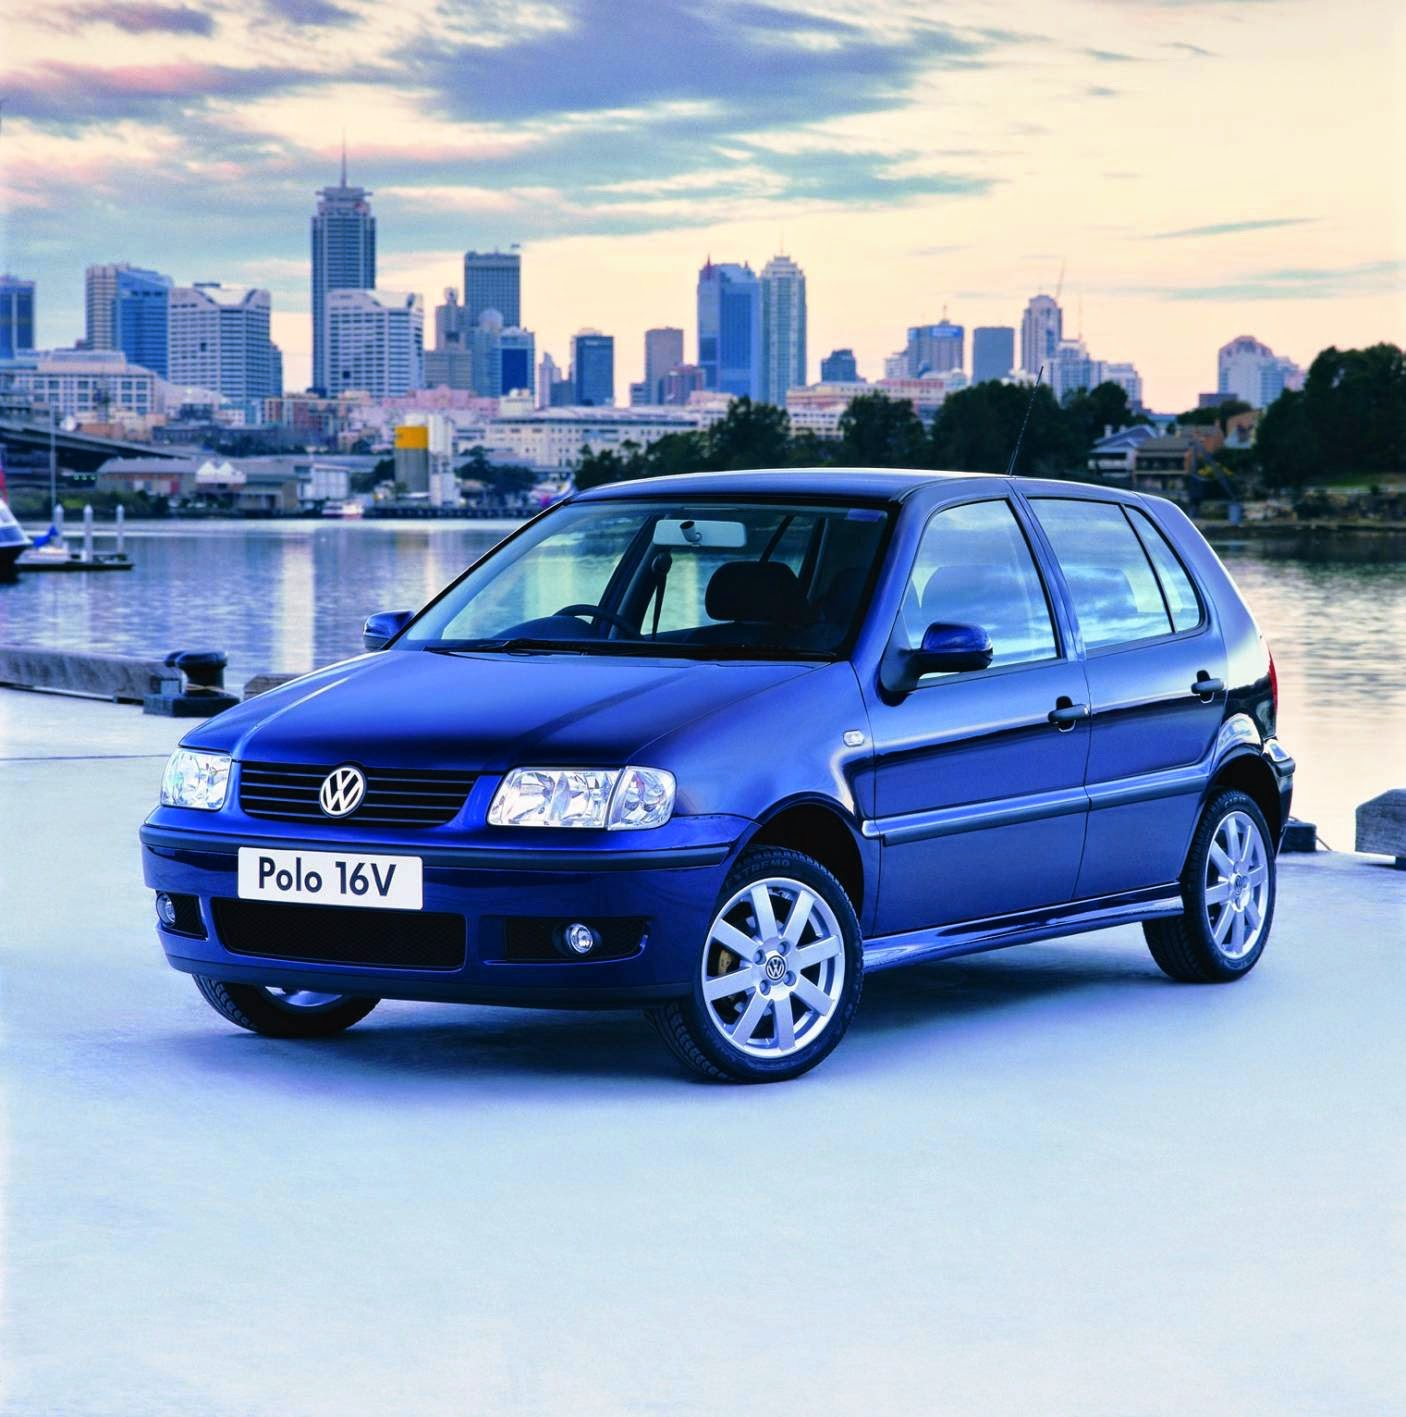 Volkswagen Polo 16v press photo at launch